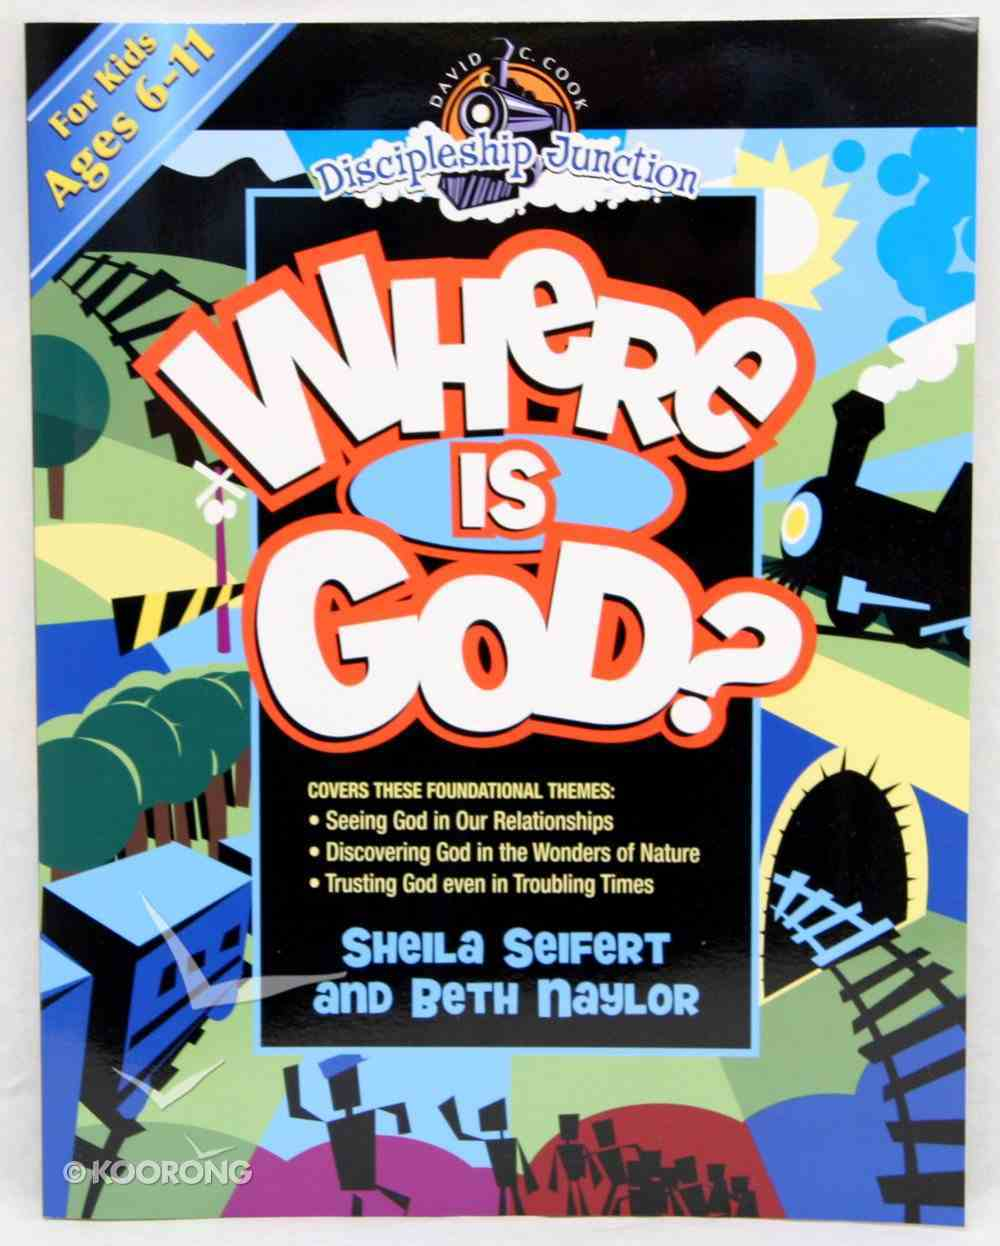 Where is God? (Discipleship Junction Series) Paperback